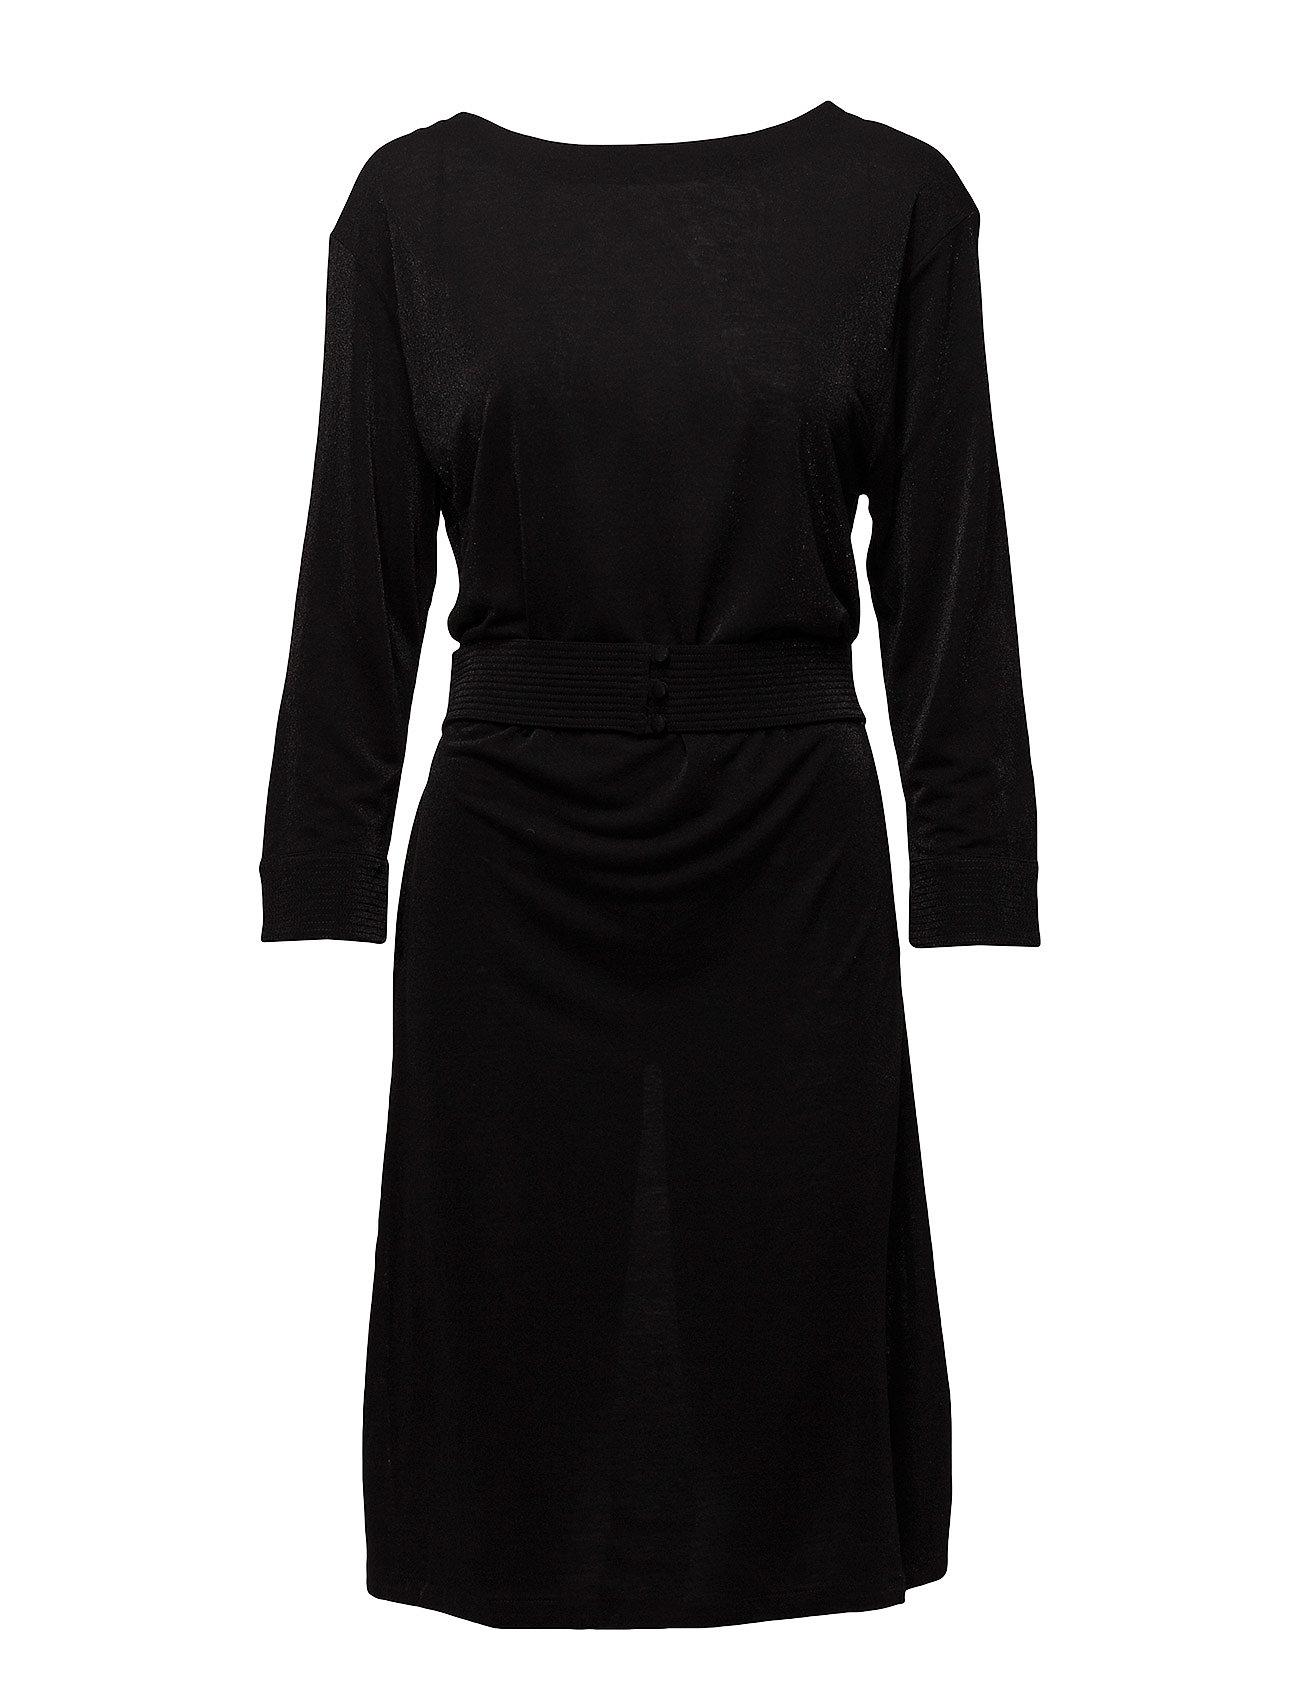 Filippa K Glitter V-neck Back Dress - BLACK